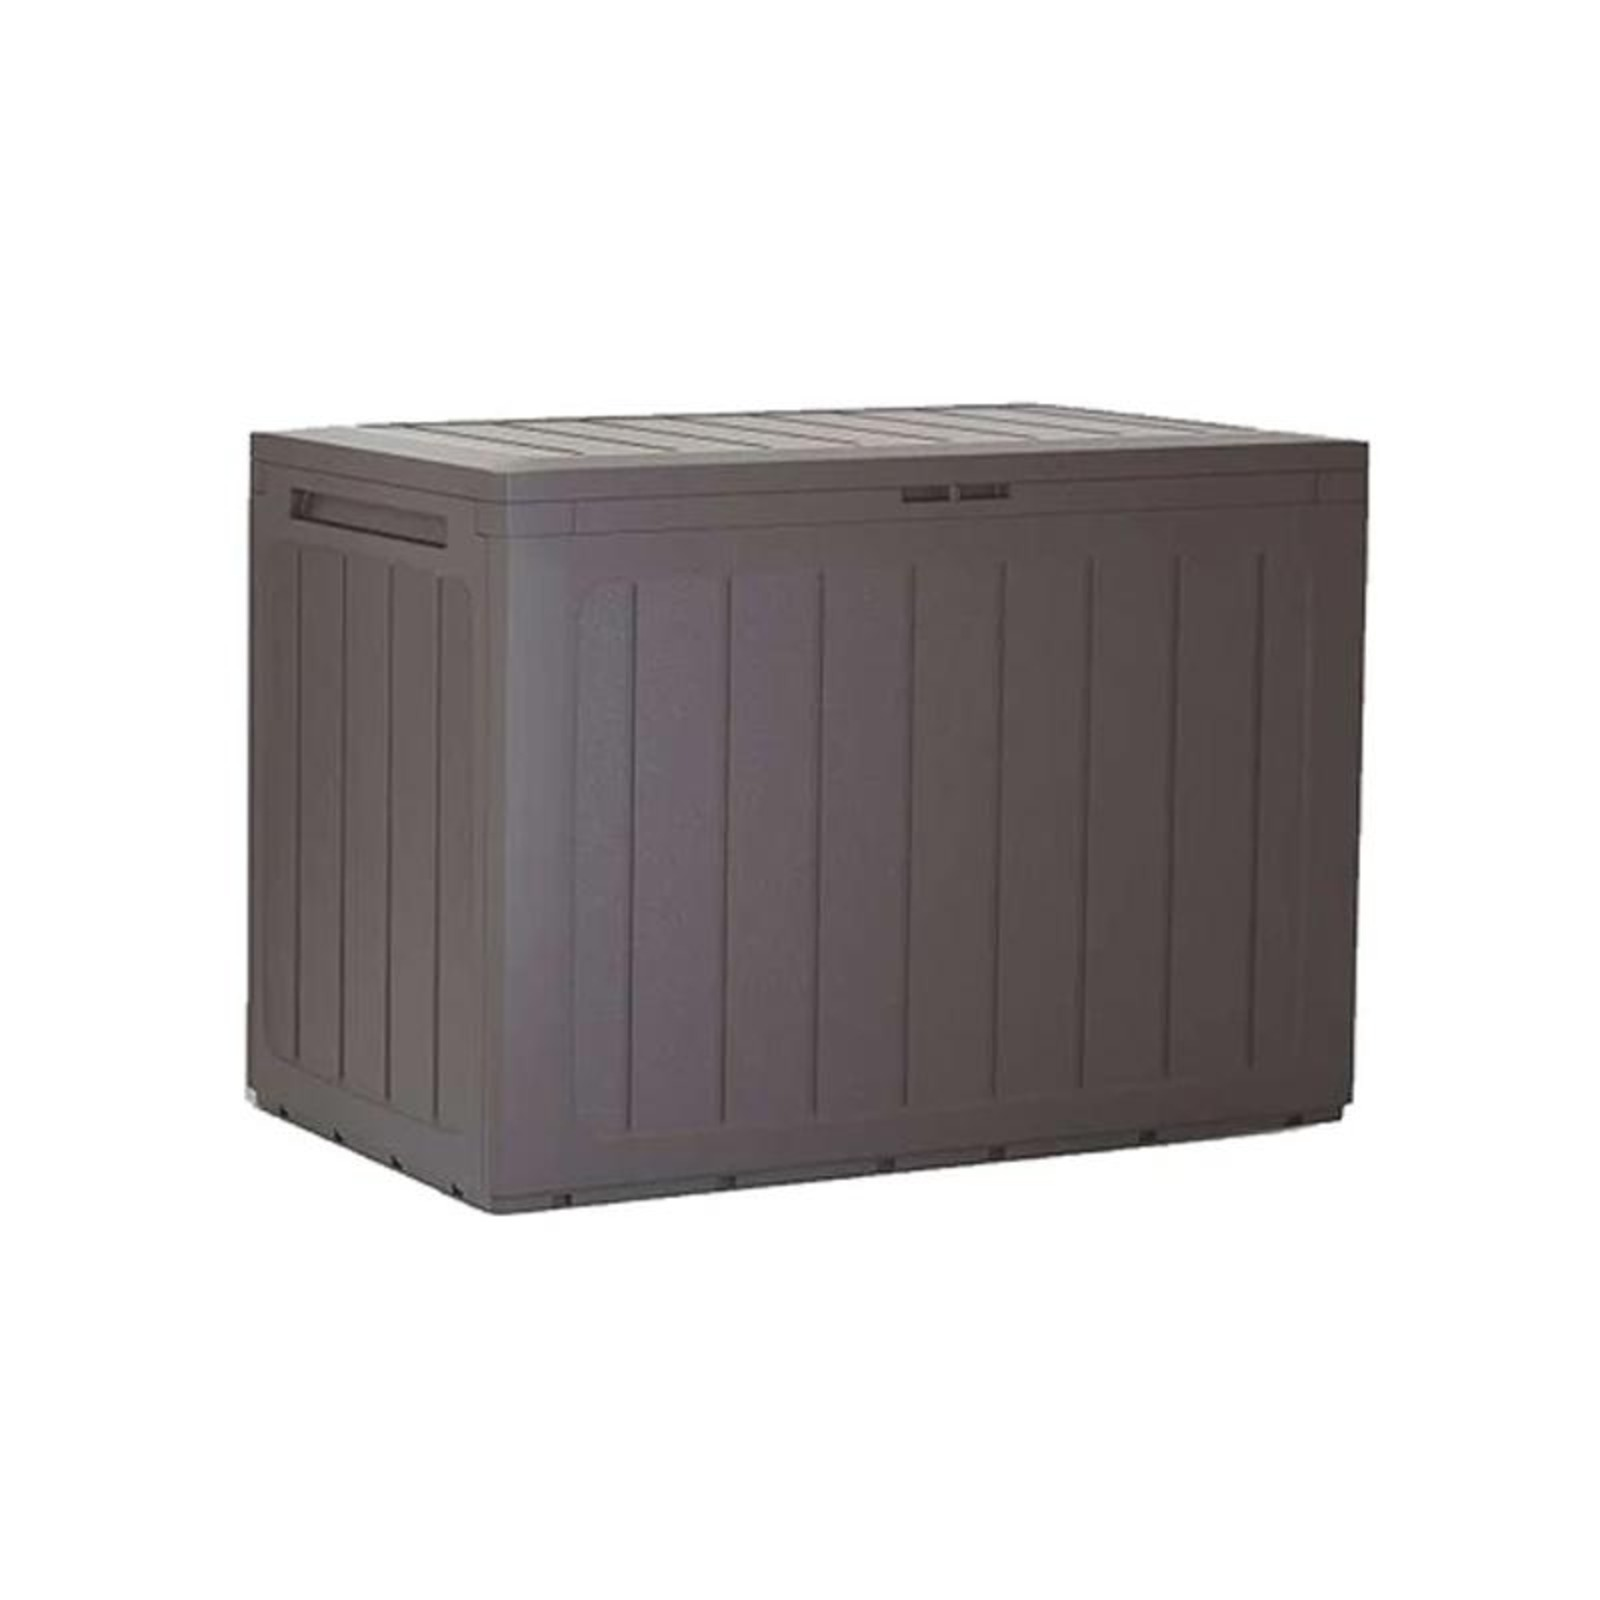 Prosperplast Boardebox Garden Storage Box (780x433x550mm)